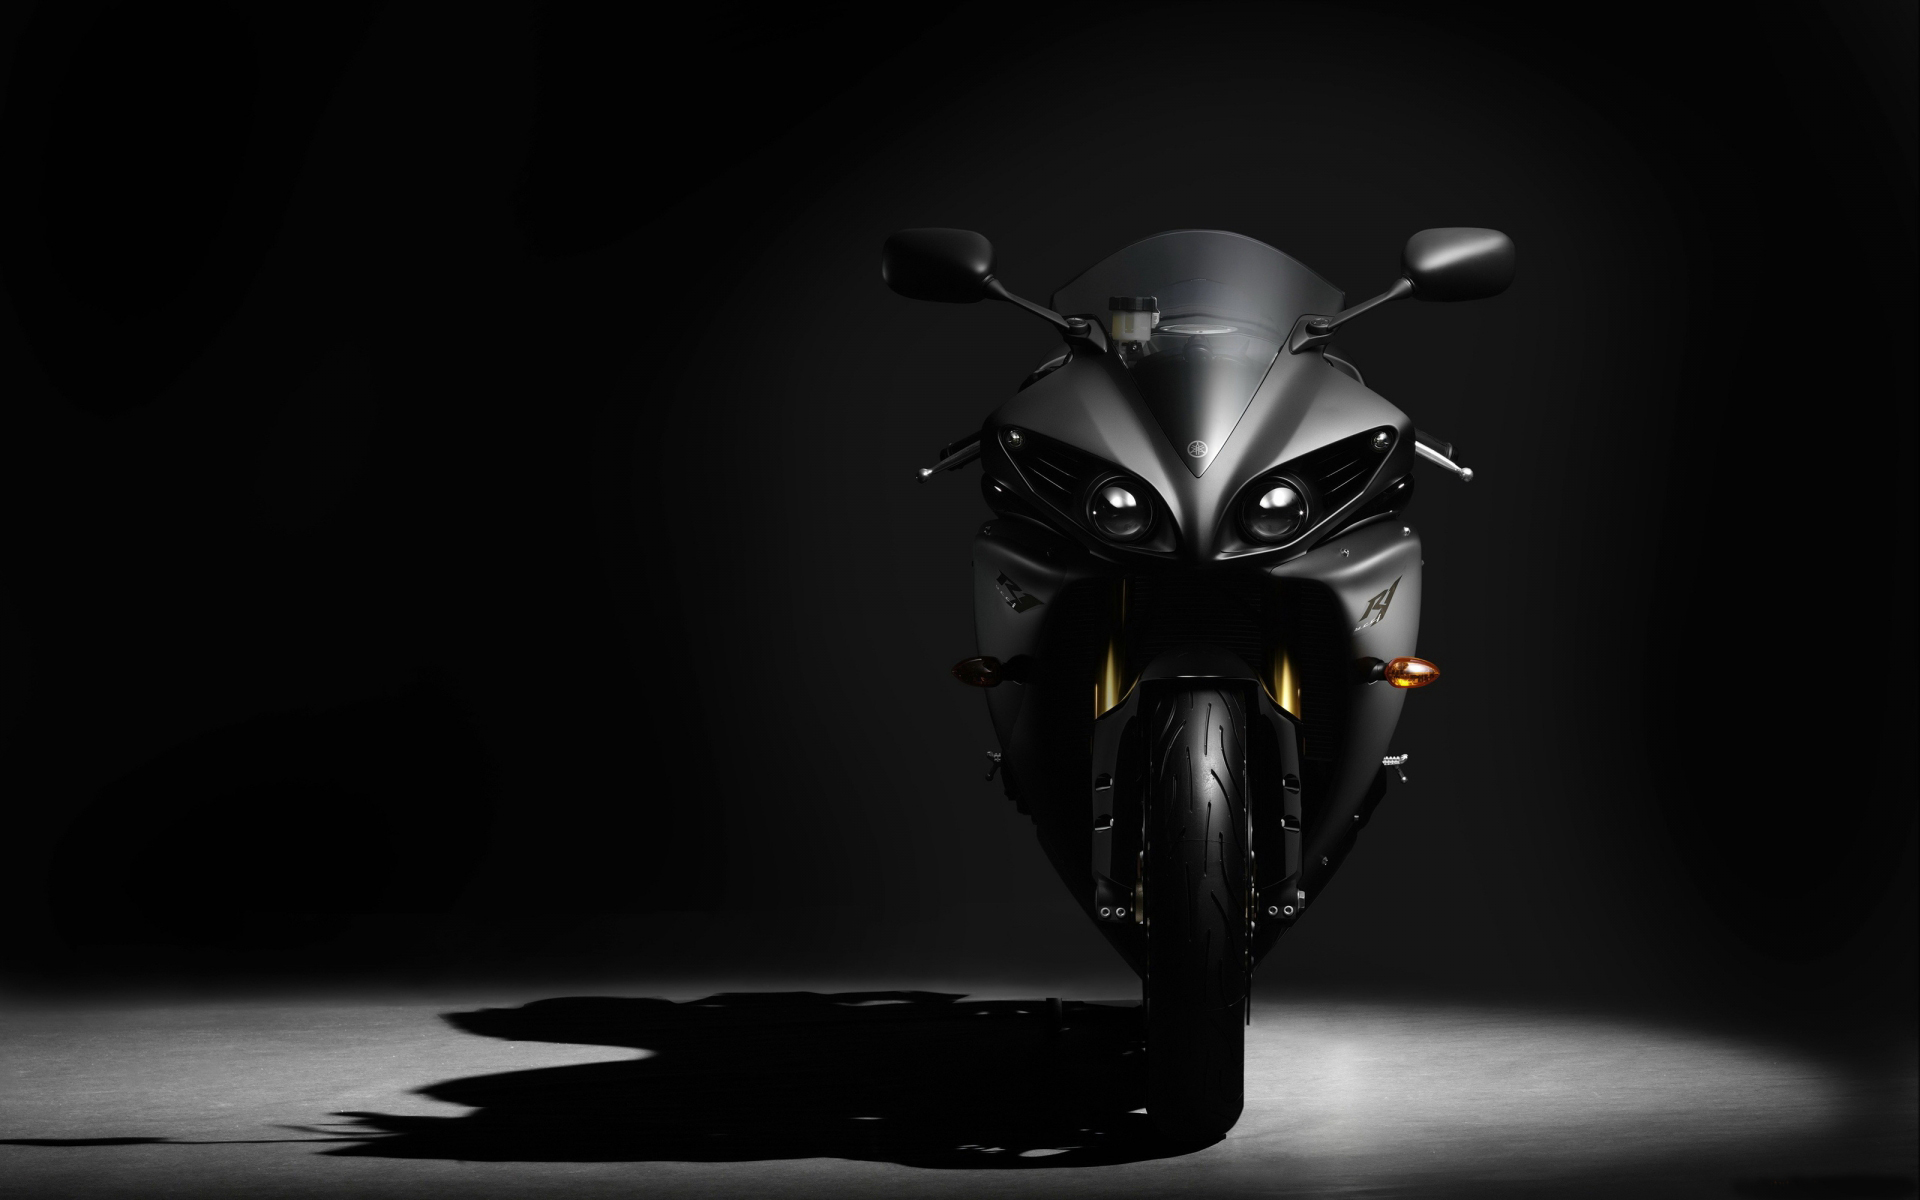 Black Bike Wallpaper